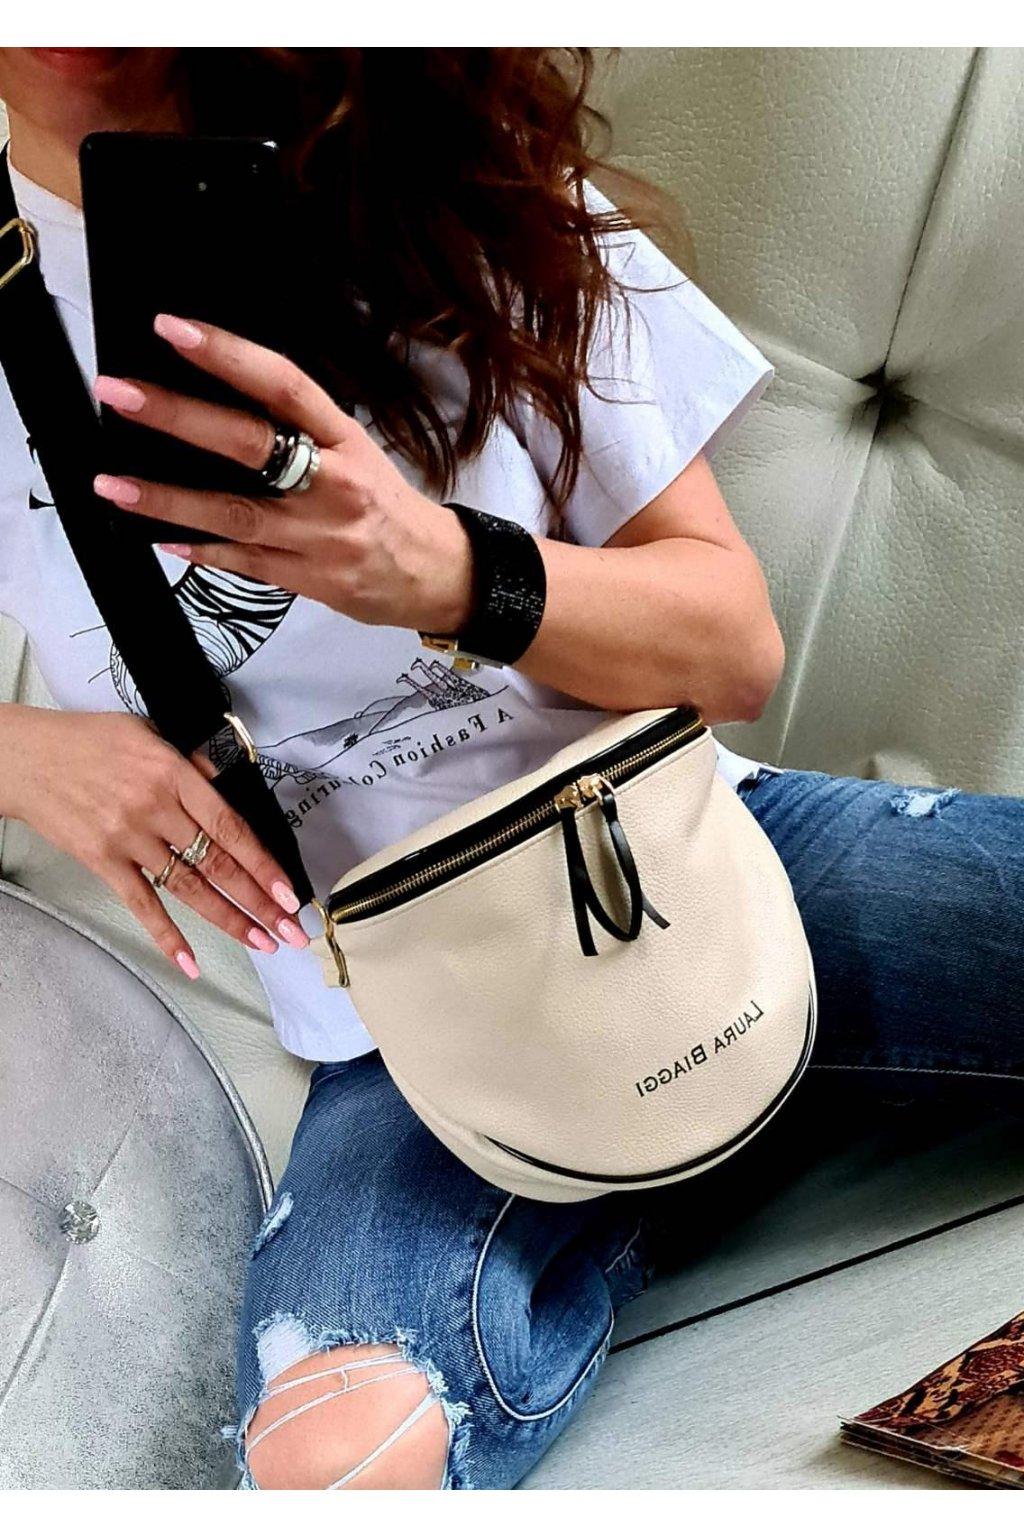 crossbody katys laura biaggi italy style luxus kabelka béžová